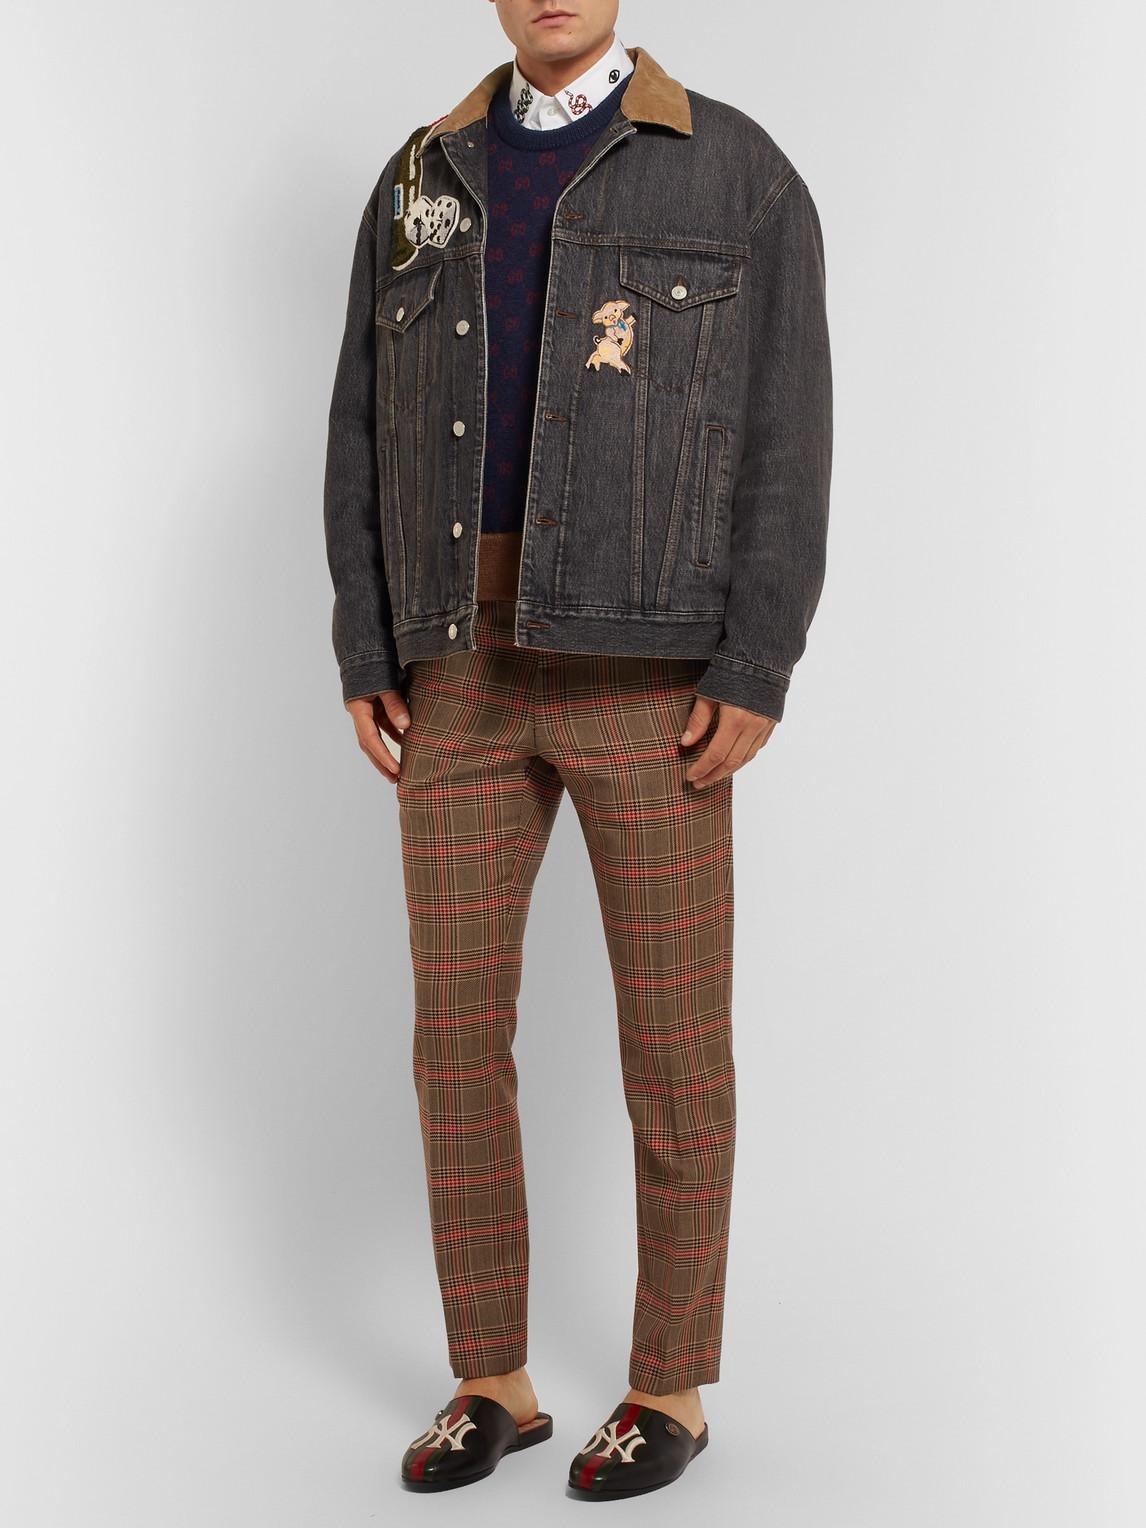 Gucci Sweaters LOGO-JACQUARD WOOL AND ALPACA-BLEND SWEATER VEST